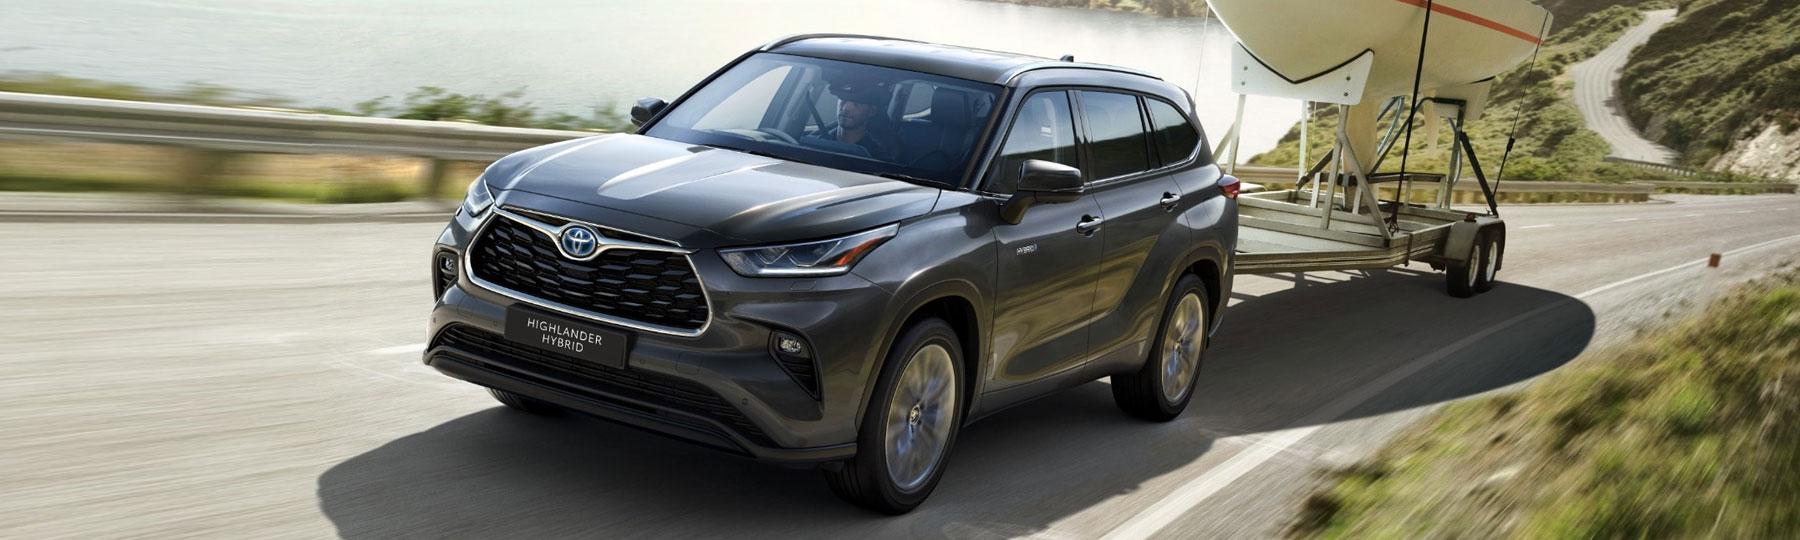 All New Toyota Highlander Business Offer